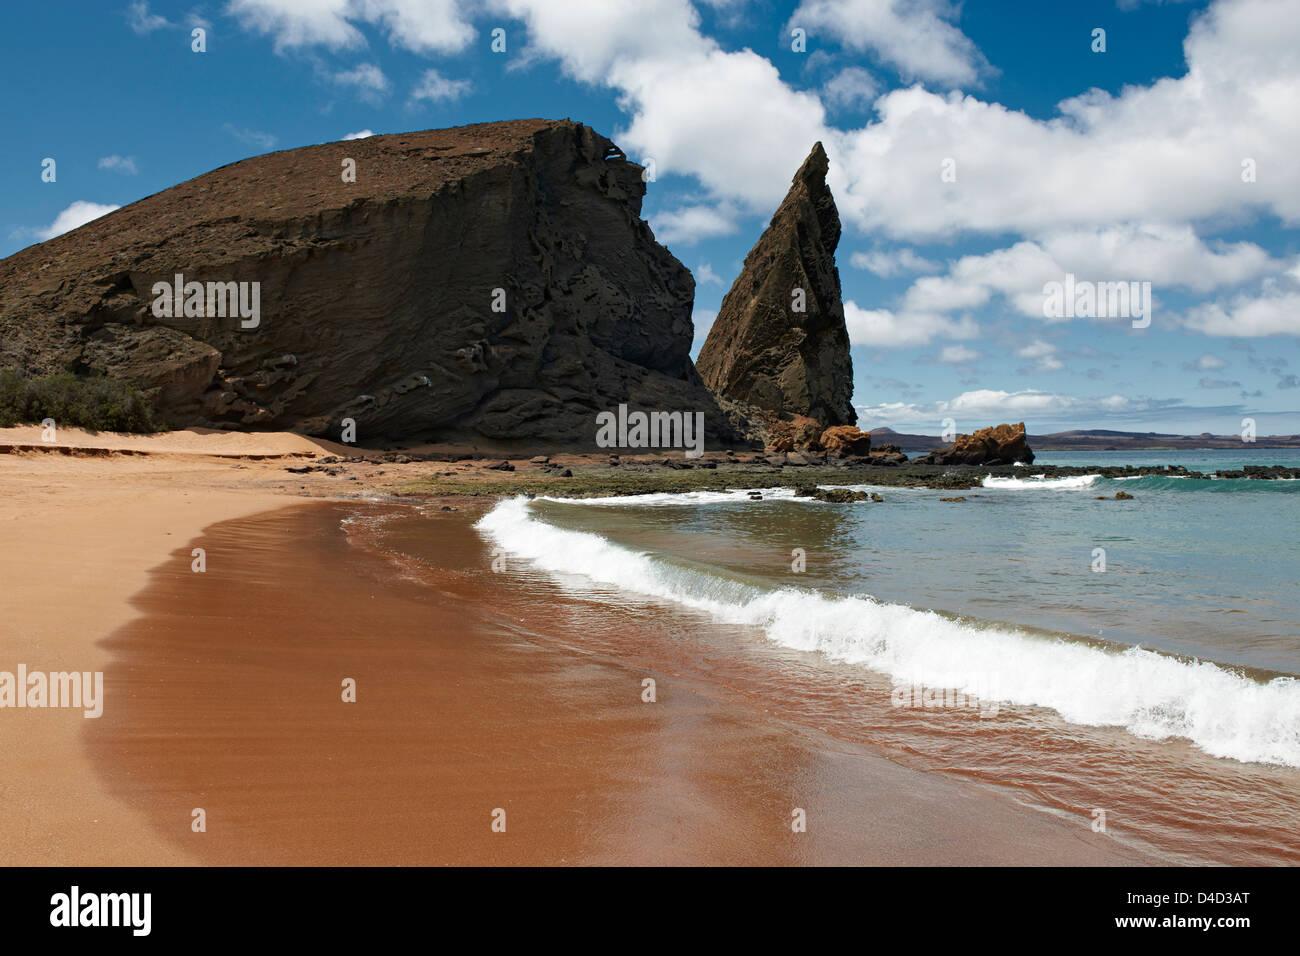 Bartolome Island, Galapagos Islands, Ecuador, South America, America - Stock Image